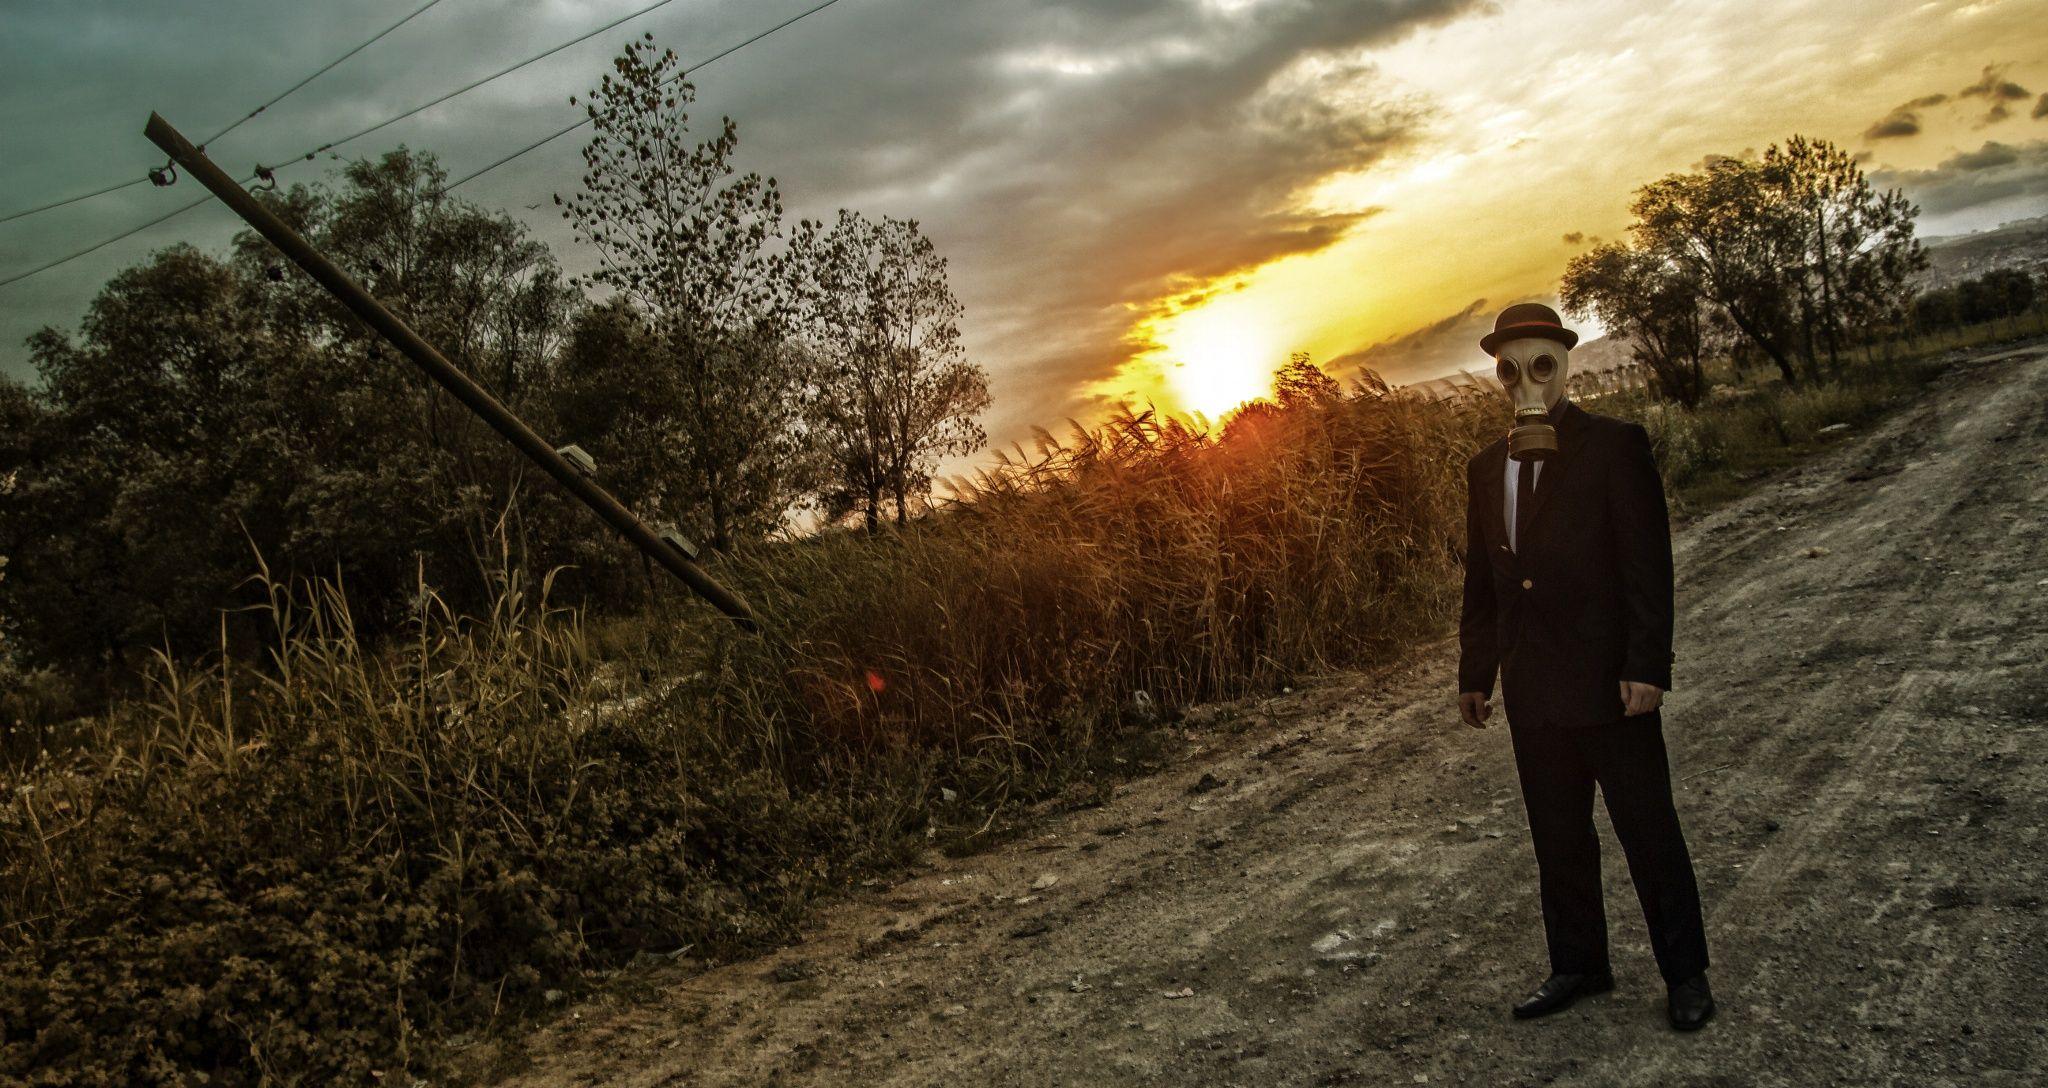 End Of Dayz By Fatih Yurur On 500px